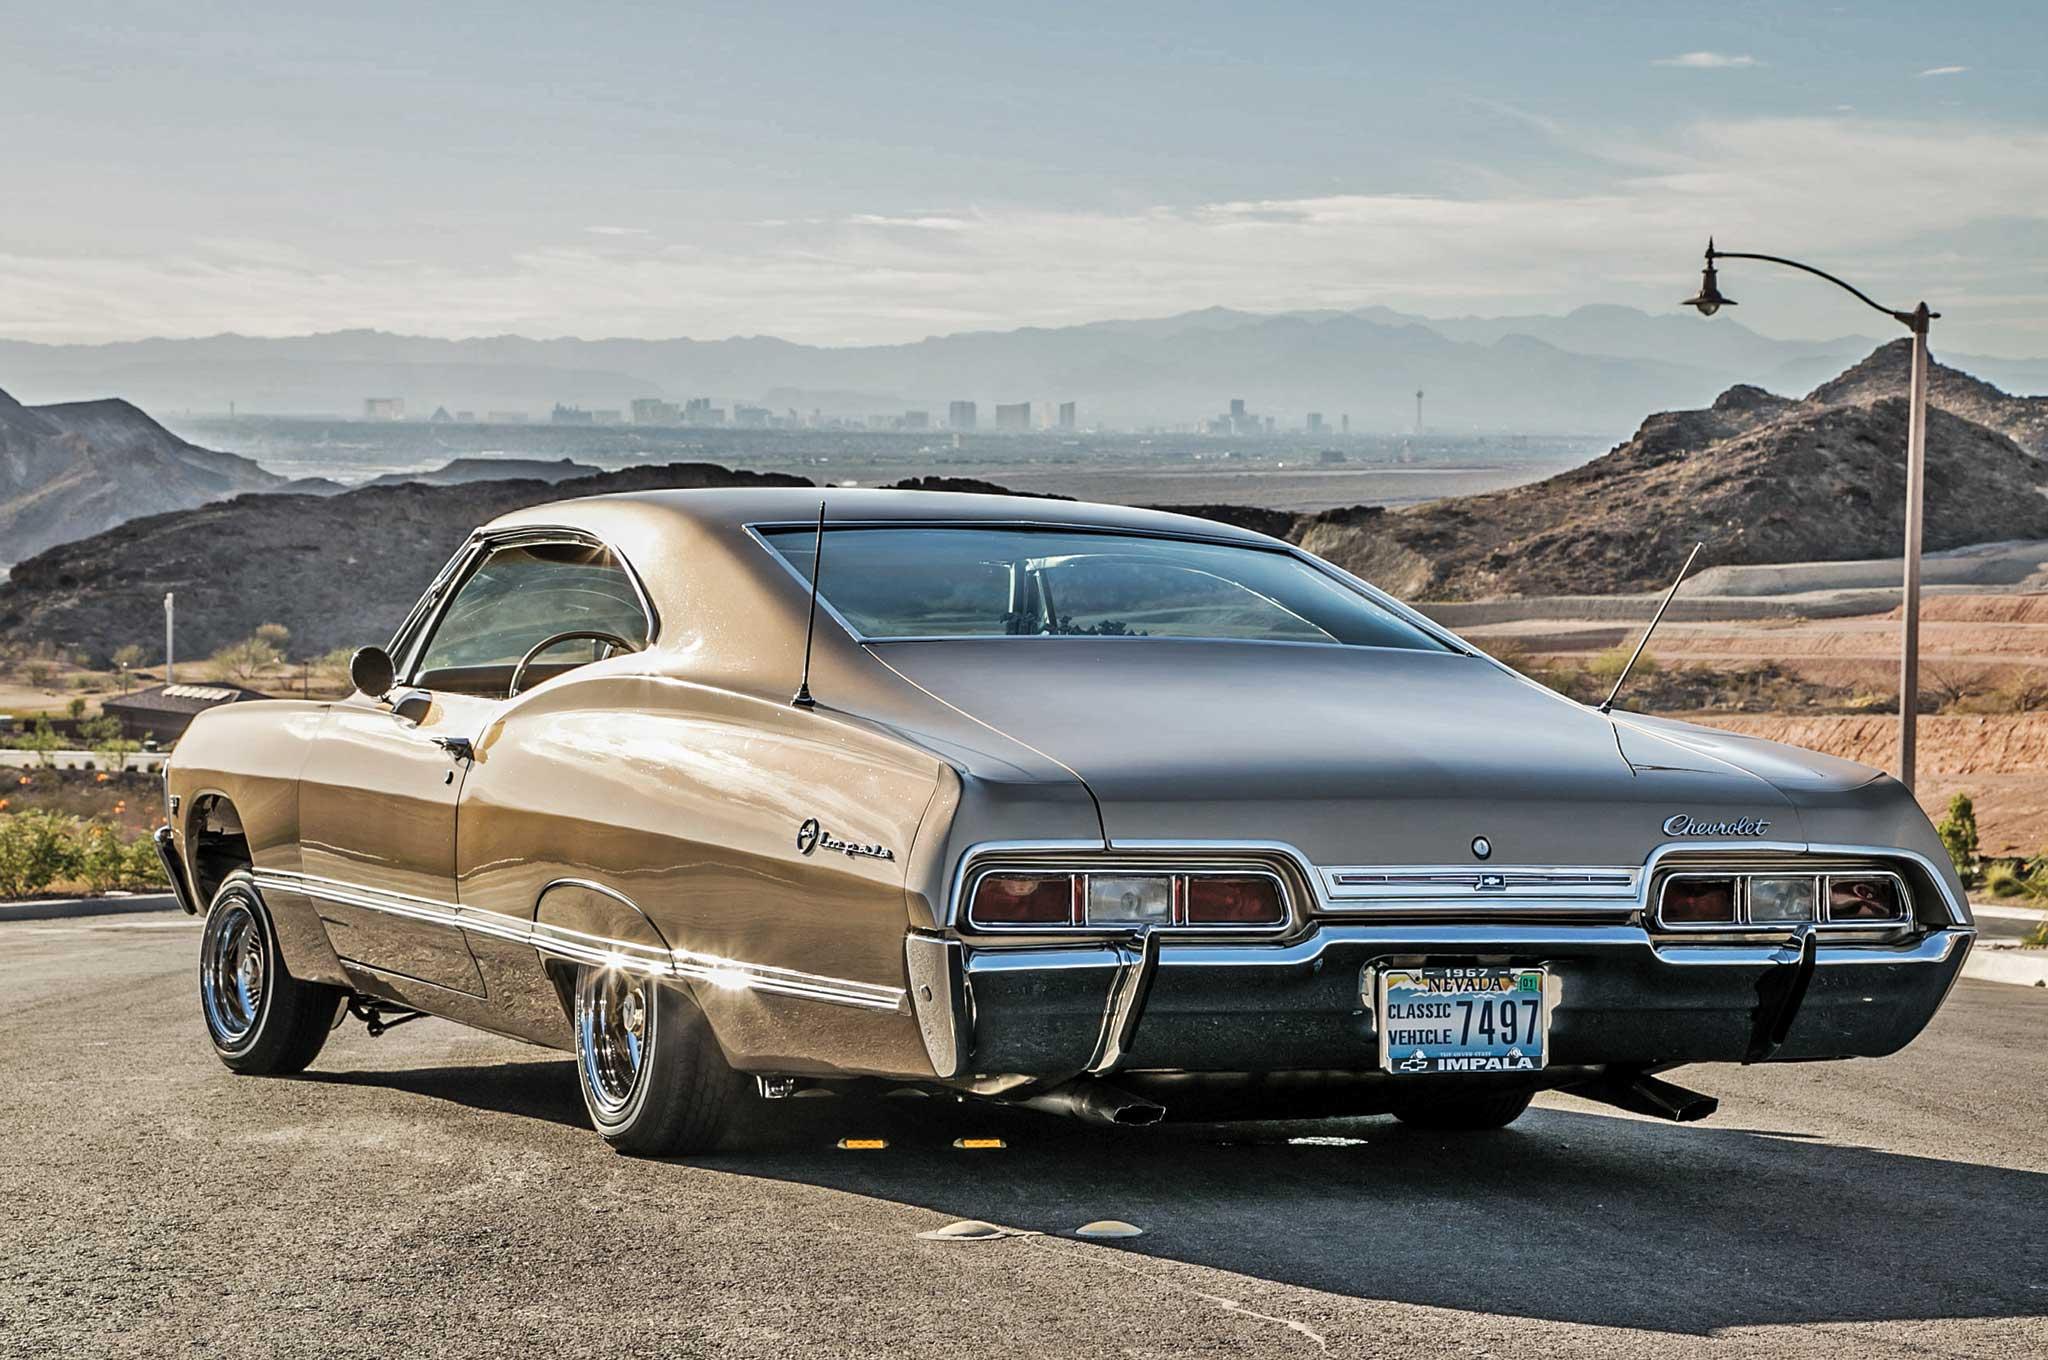 001 1967 chevrolet impala taillights